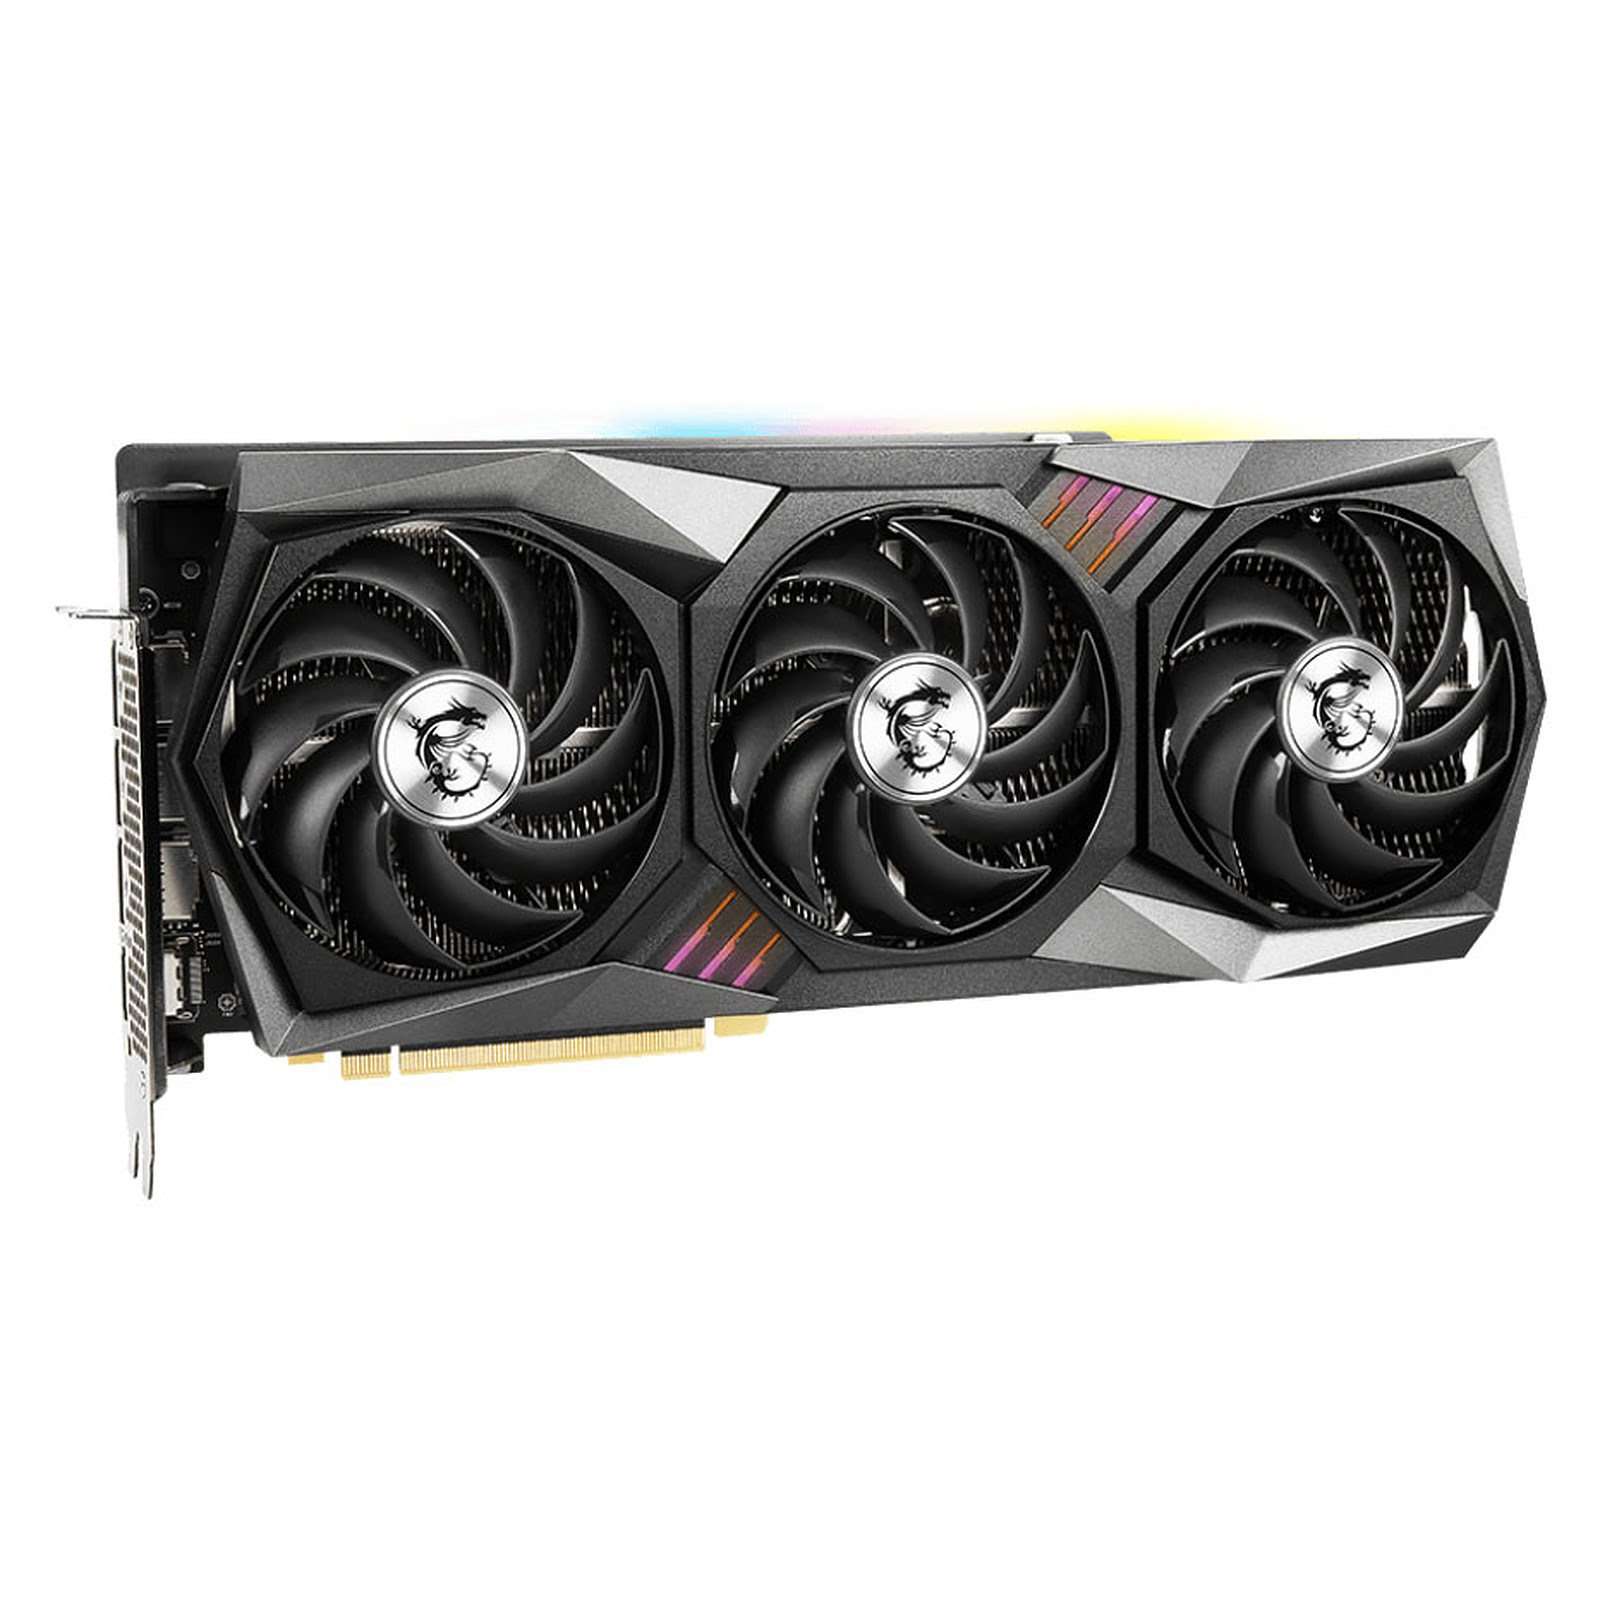 GeForce RTX 3080 GAMING Z TRIO 10G LHR (912-V389-205) - Achat / Vente Carte graphique sur Picata.fr - 3